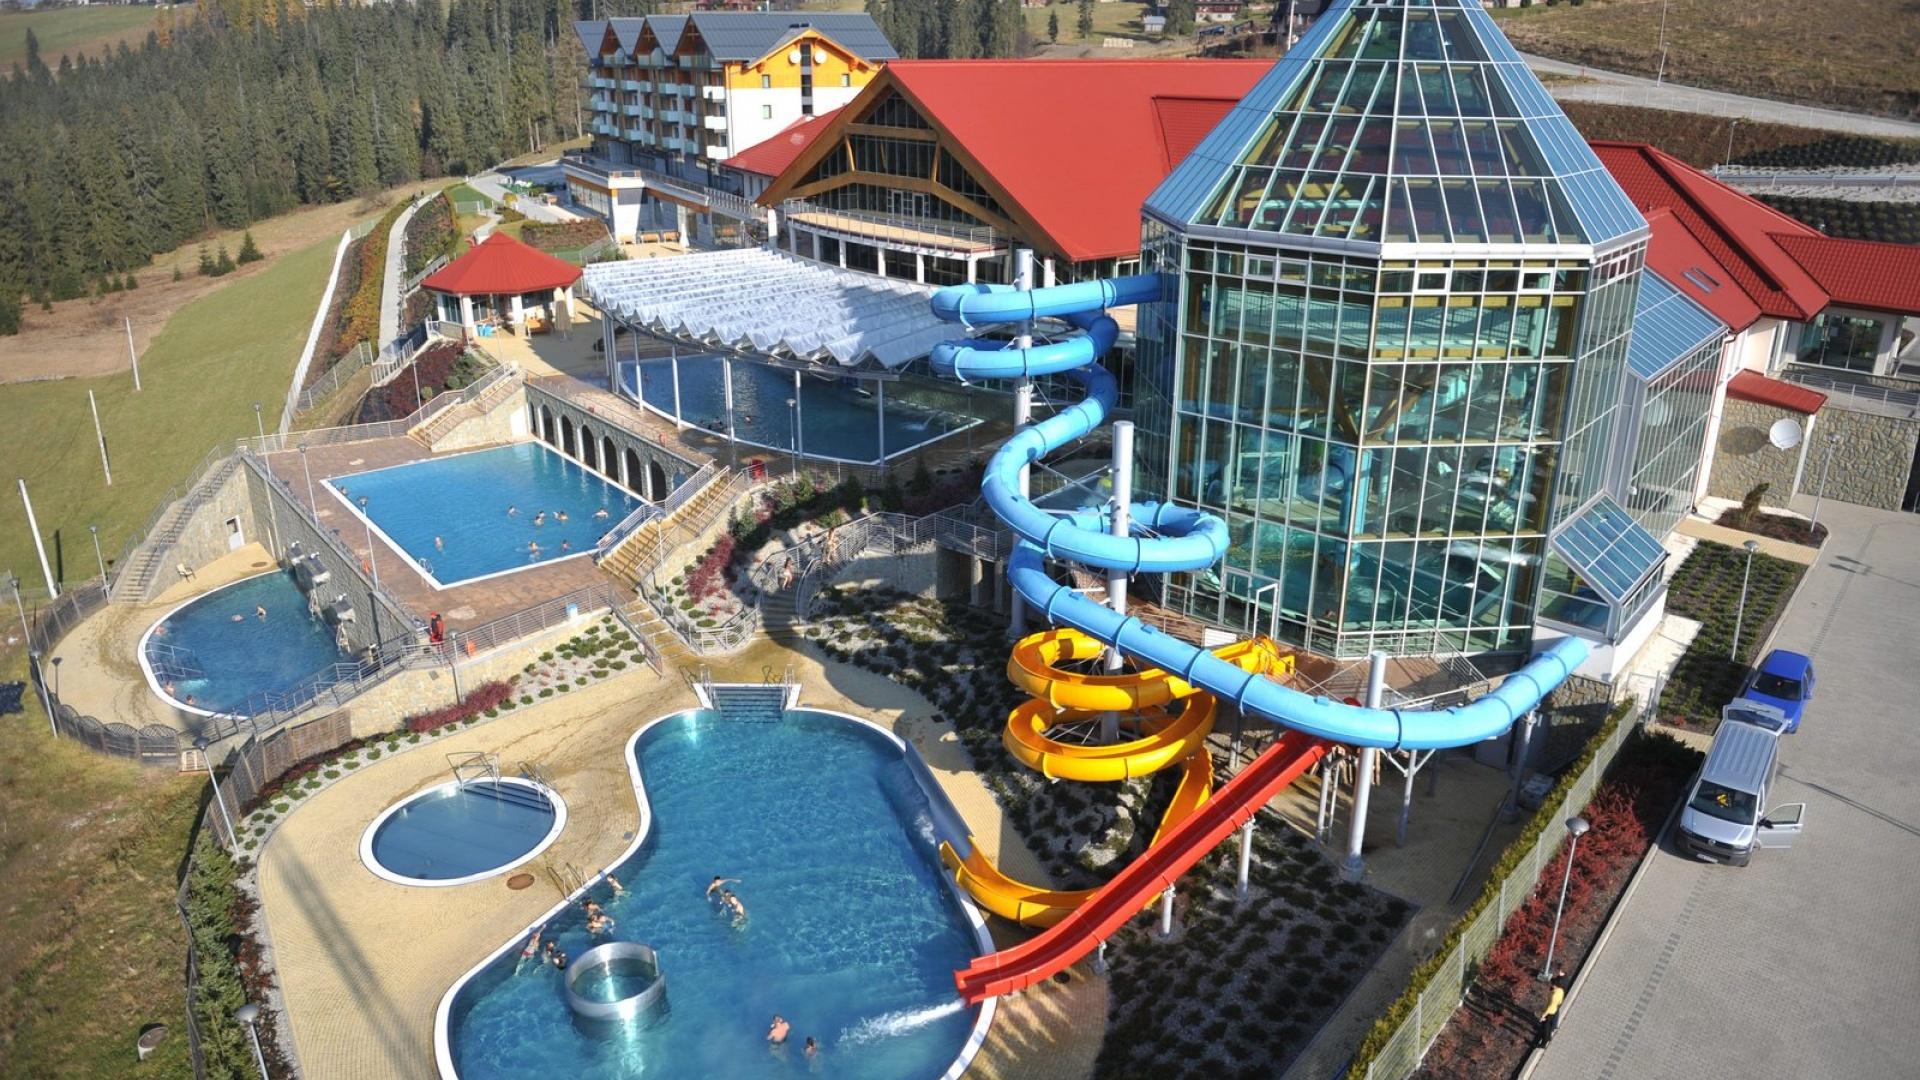 bukovina-terma-rodzinny-aquapark